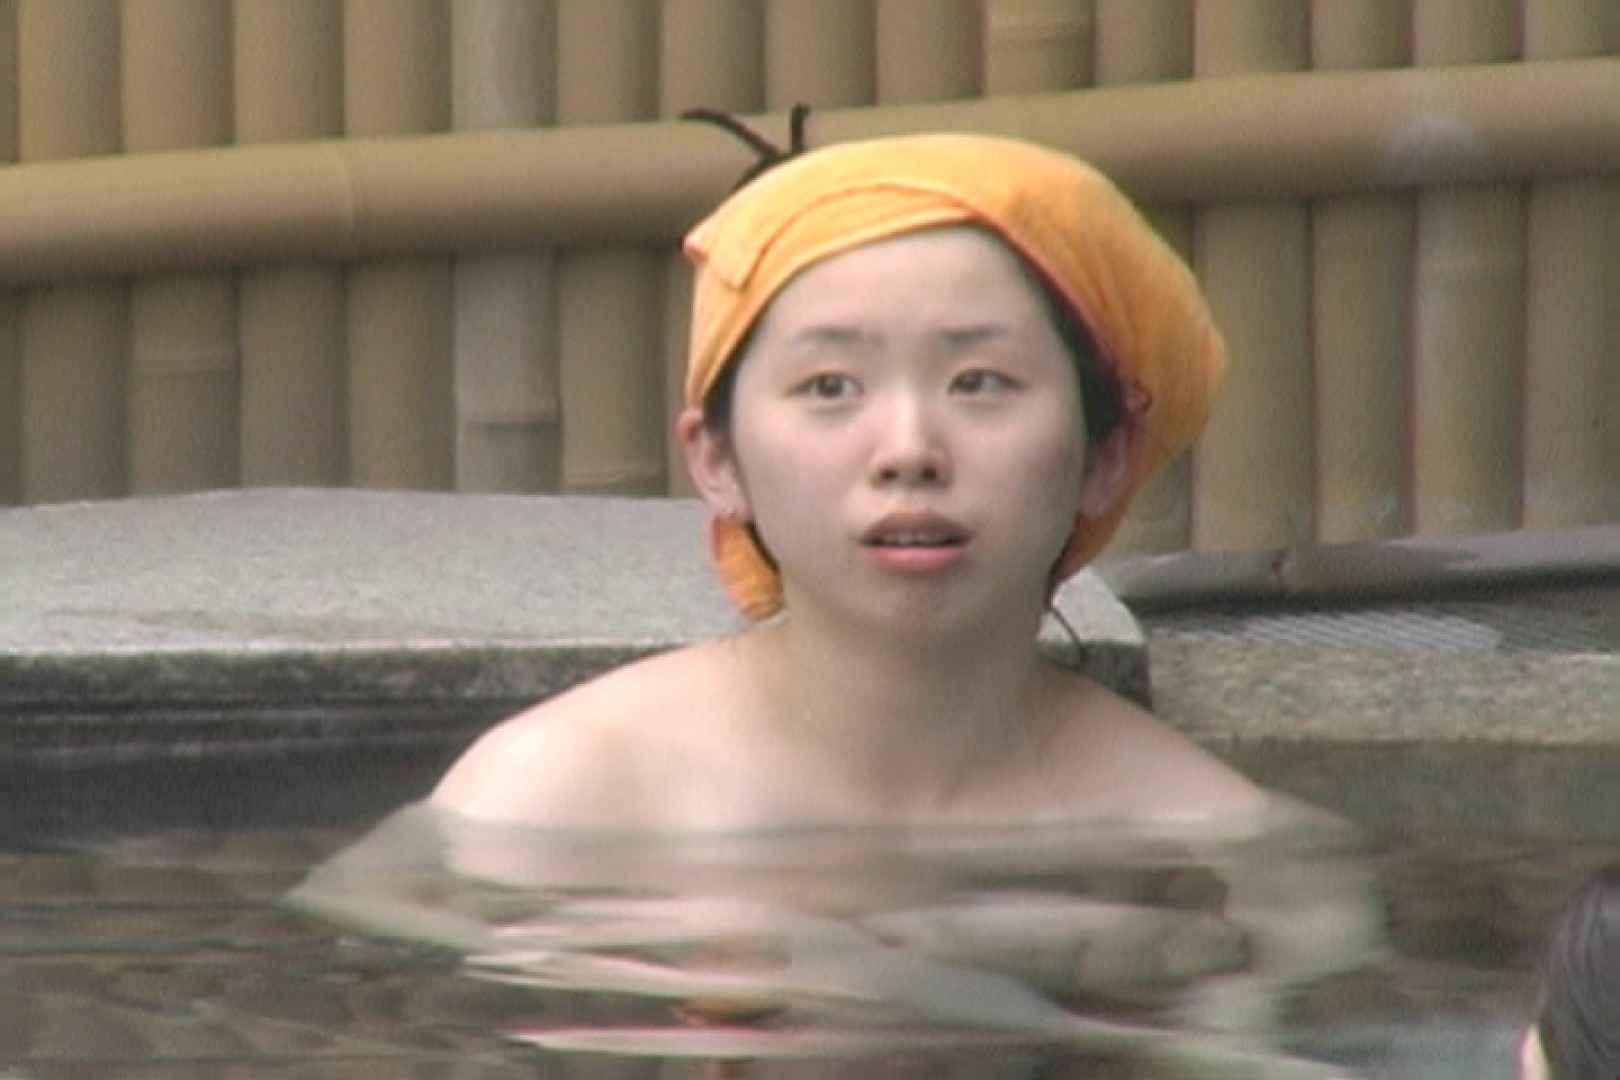 Aquaな露天風呂Vol.641 盗撮師作品  97pic 27